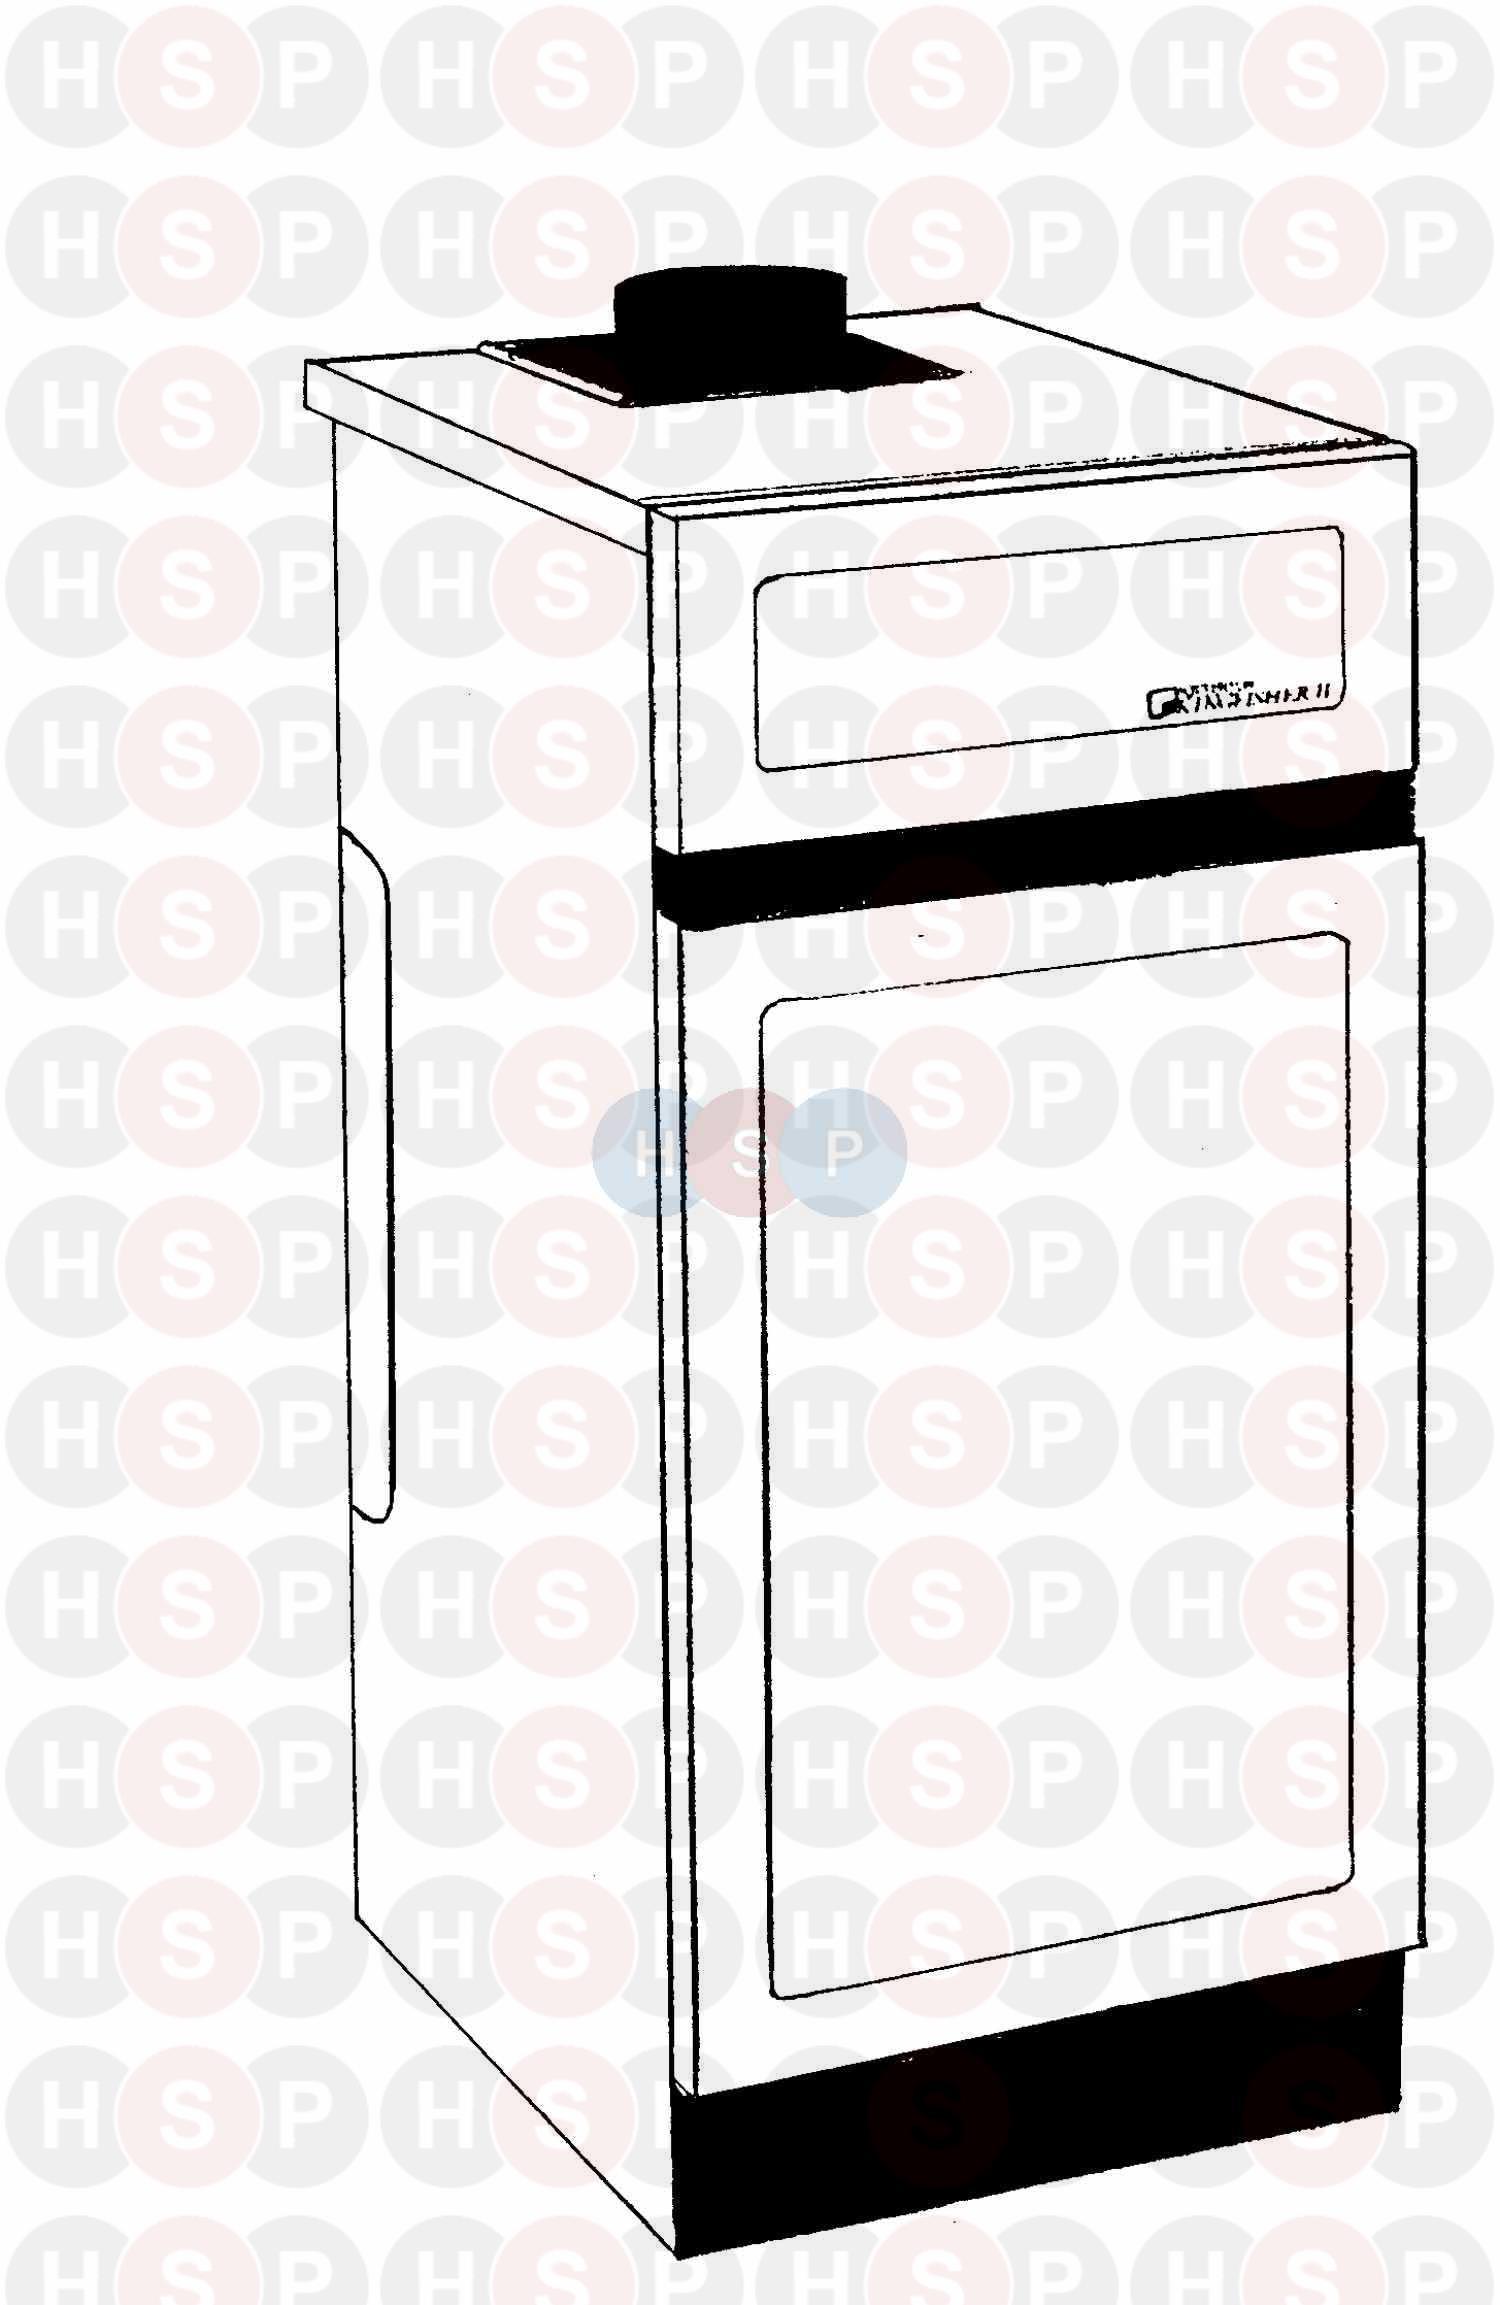 Potterton KINGFISHER MK II CF60 (IDENTIFICATION) Diagram